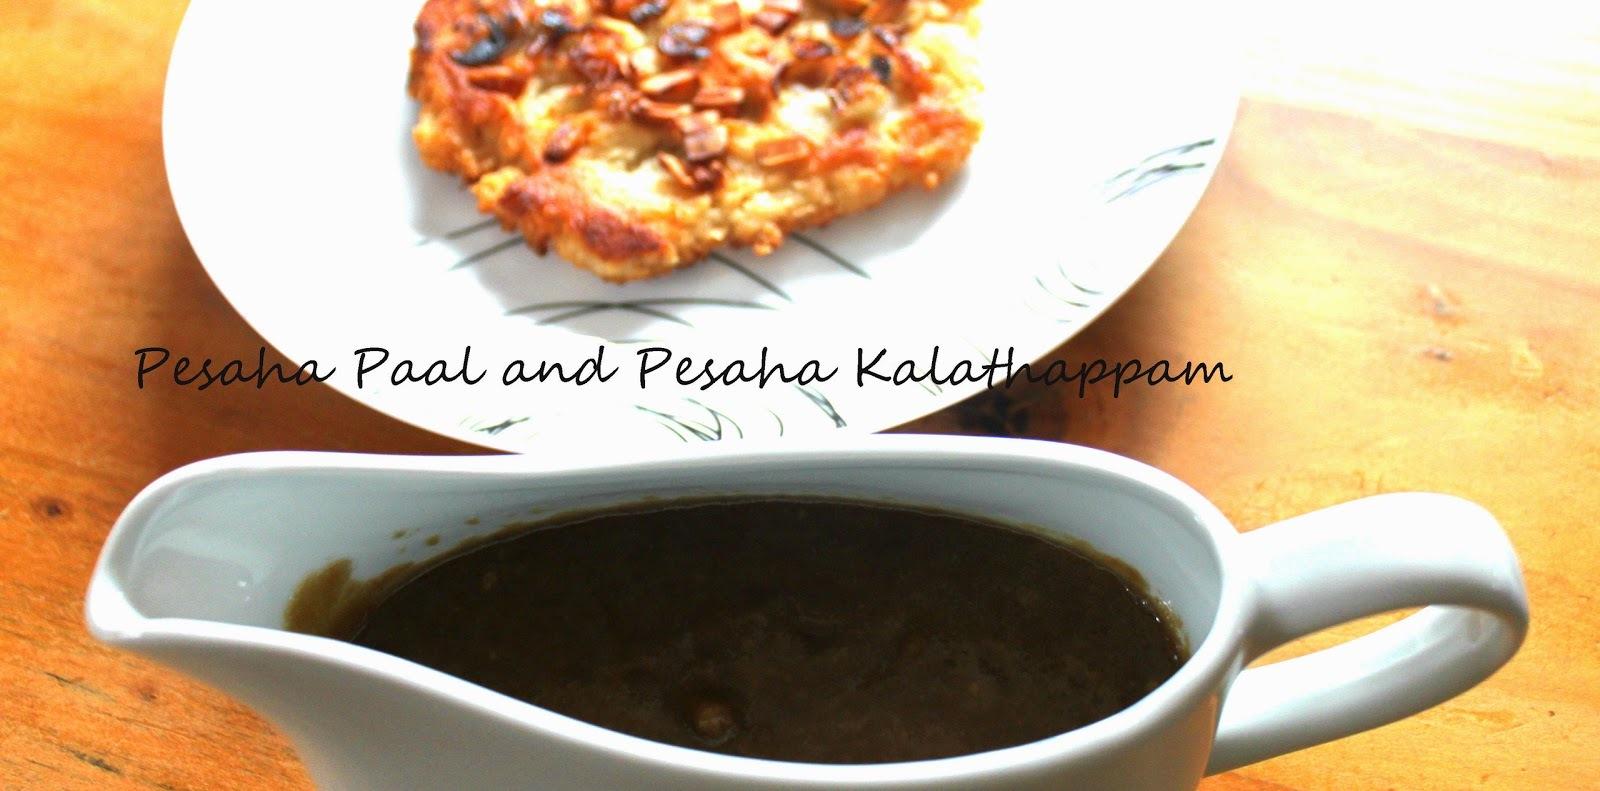 Pesaha paal,  Kalathappam, Kurisapam and Indri appam  | Maundy Thursday Special  | Kukskitchen